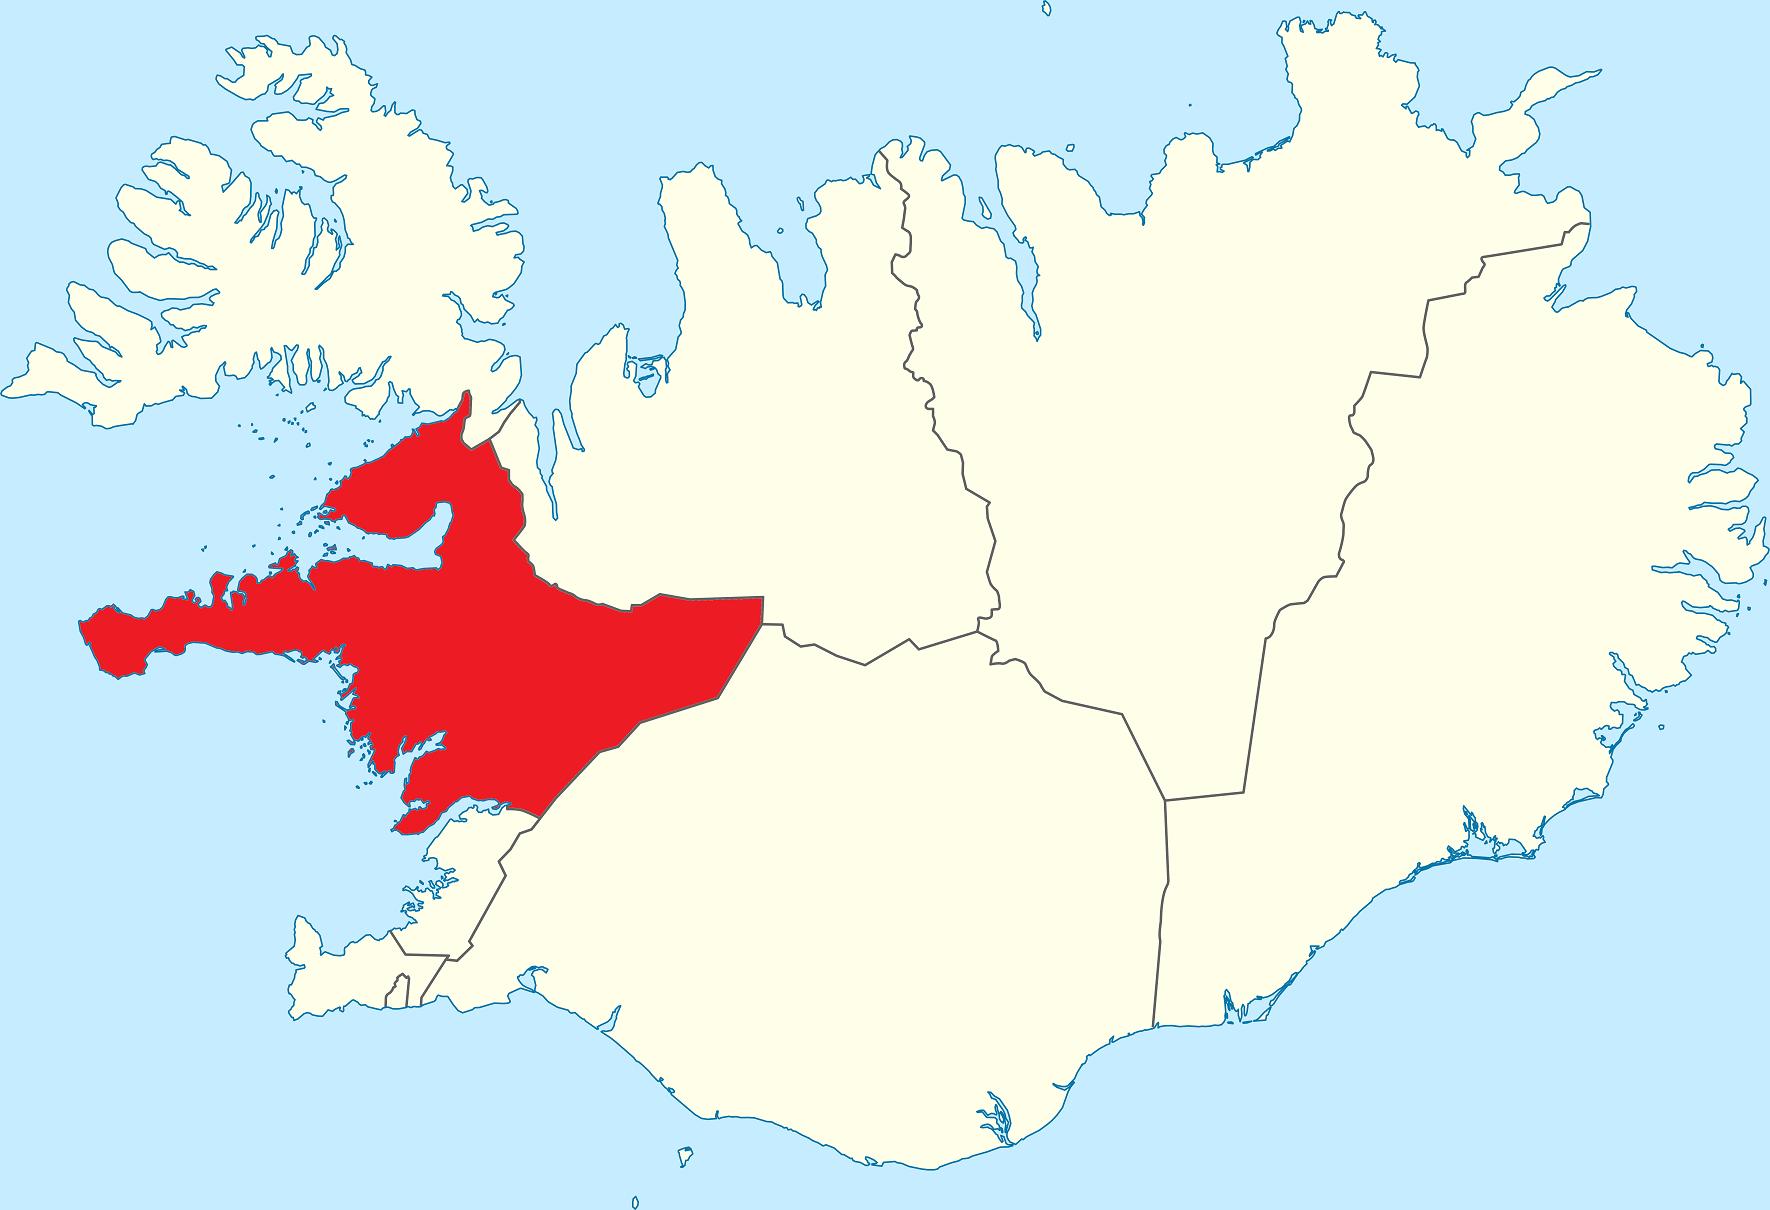 Image:Vesturland